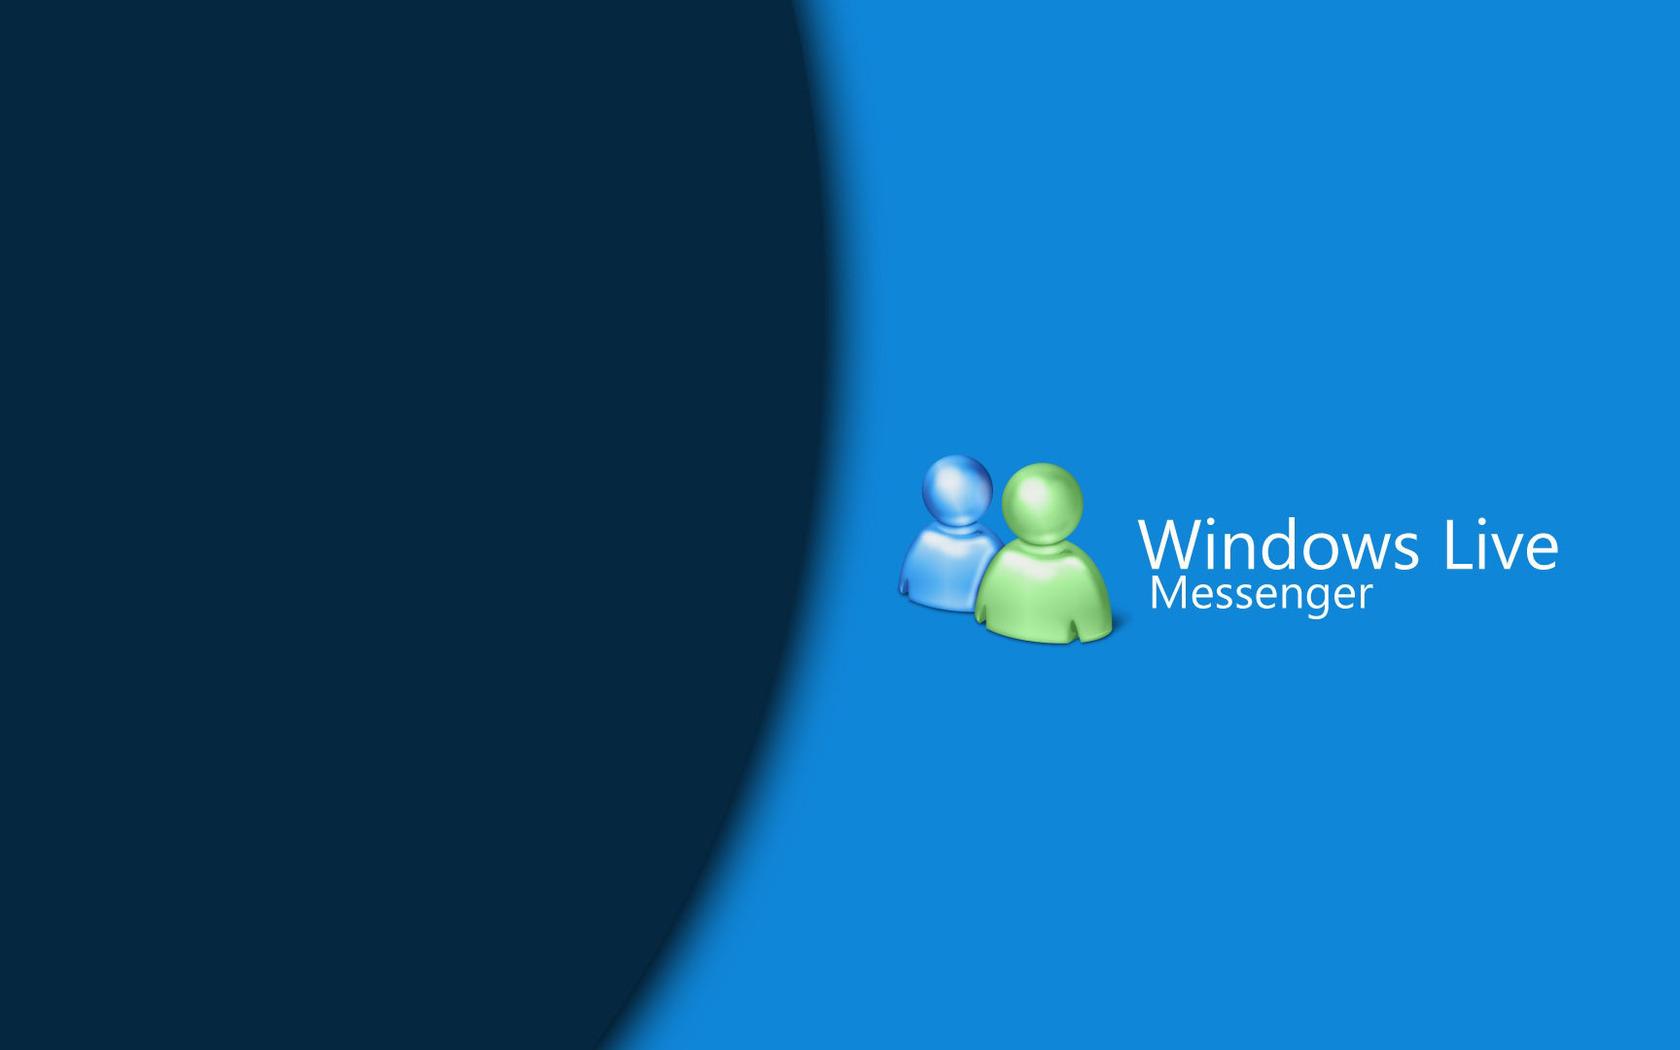 Windows Live wallpaper 10511 1680x1050